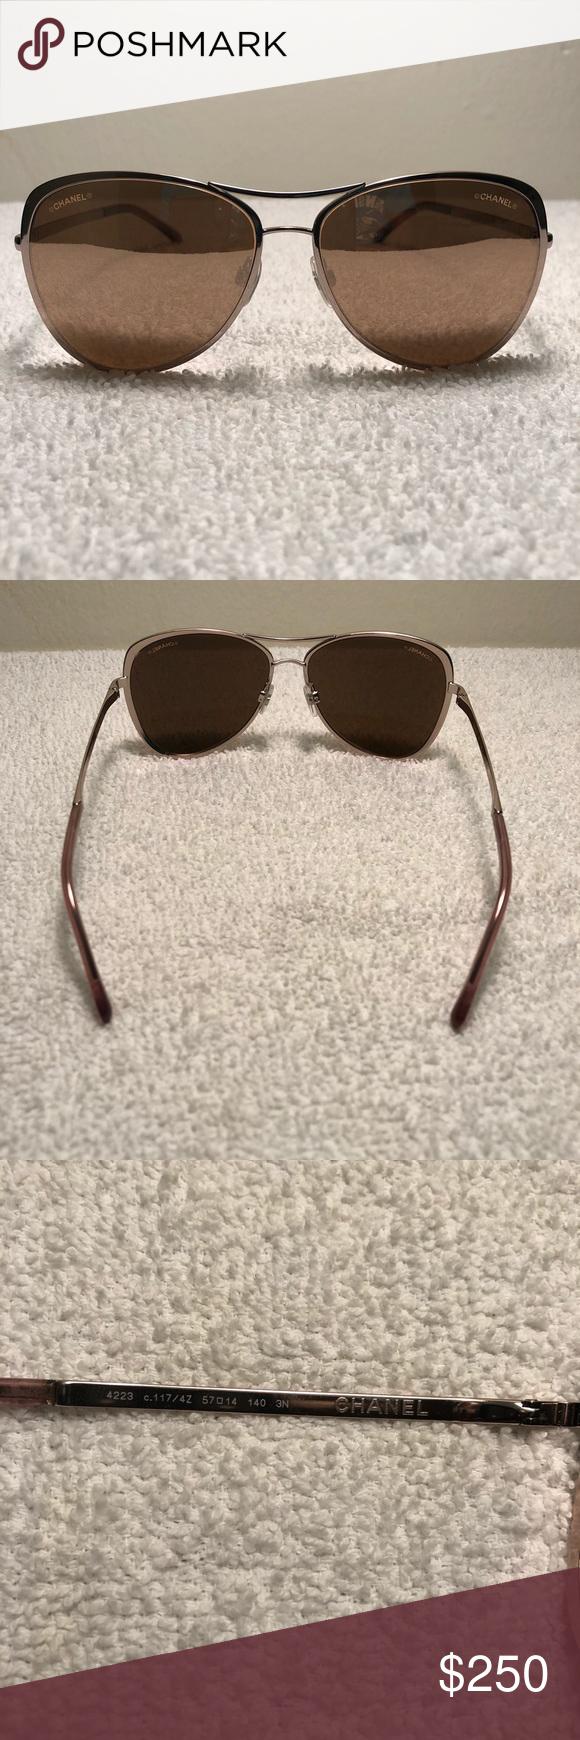 6dba9f5daab Chanel 4223 c.117 4Z Pilot Pink Gold Sunglasses Chanel 4223 c.117 4Z ...